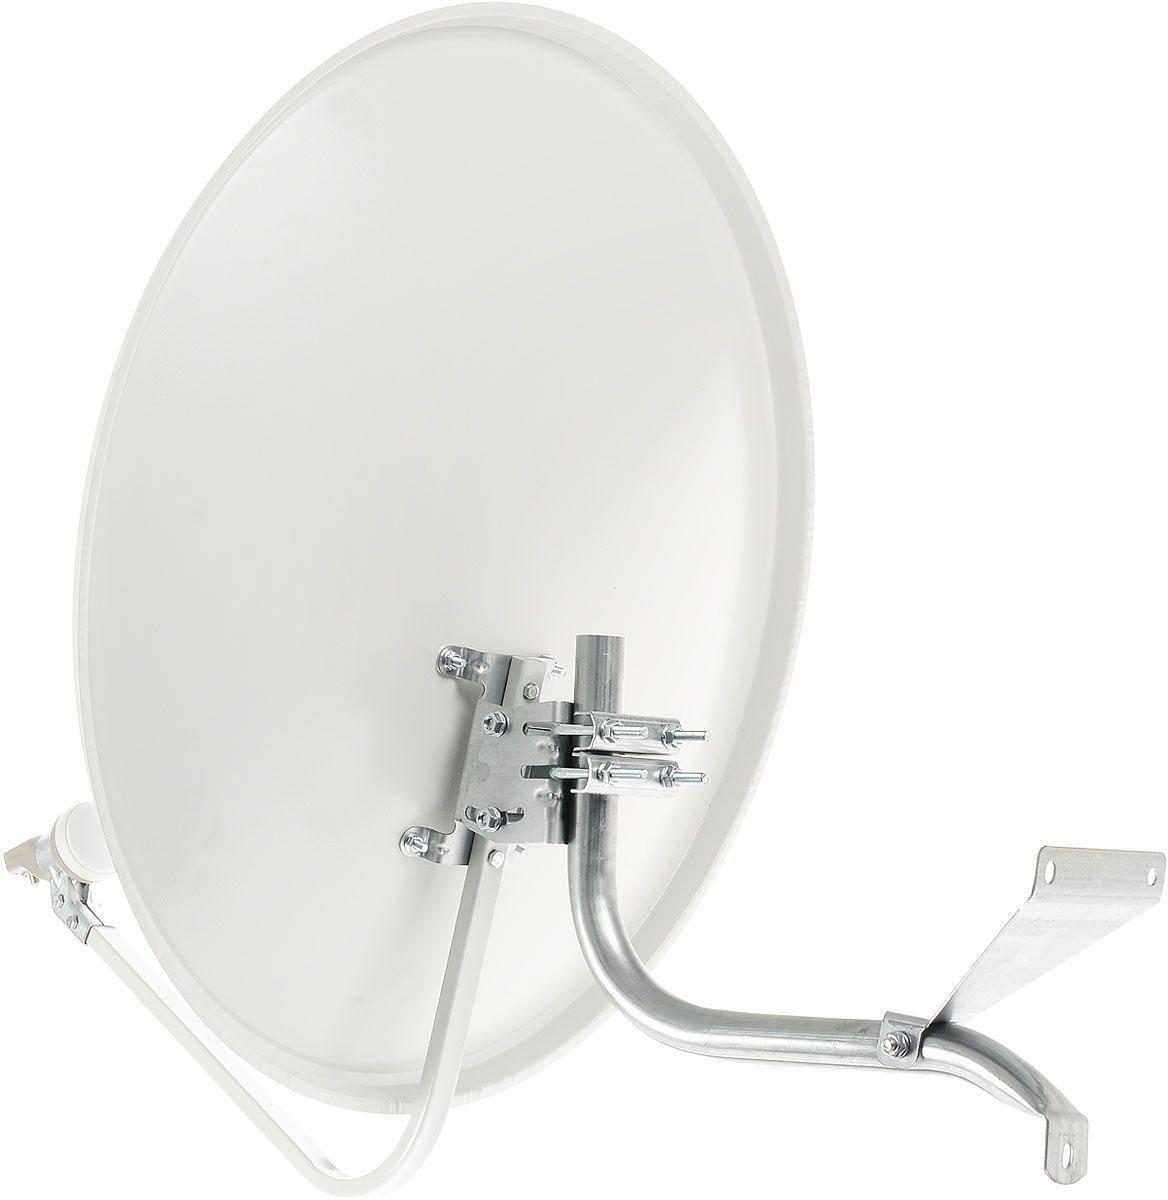 МТС комплект спутникового ТВ № 171 комплект цифрового тв нтв плюс hd simple сибирь